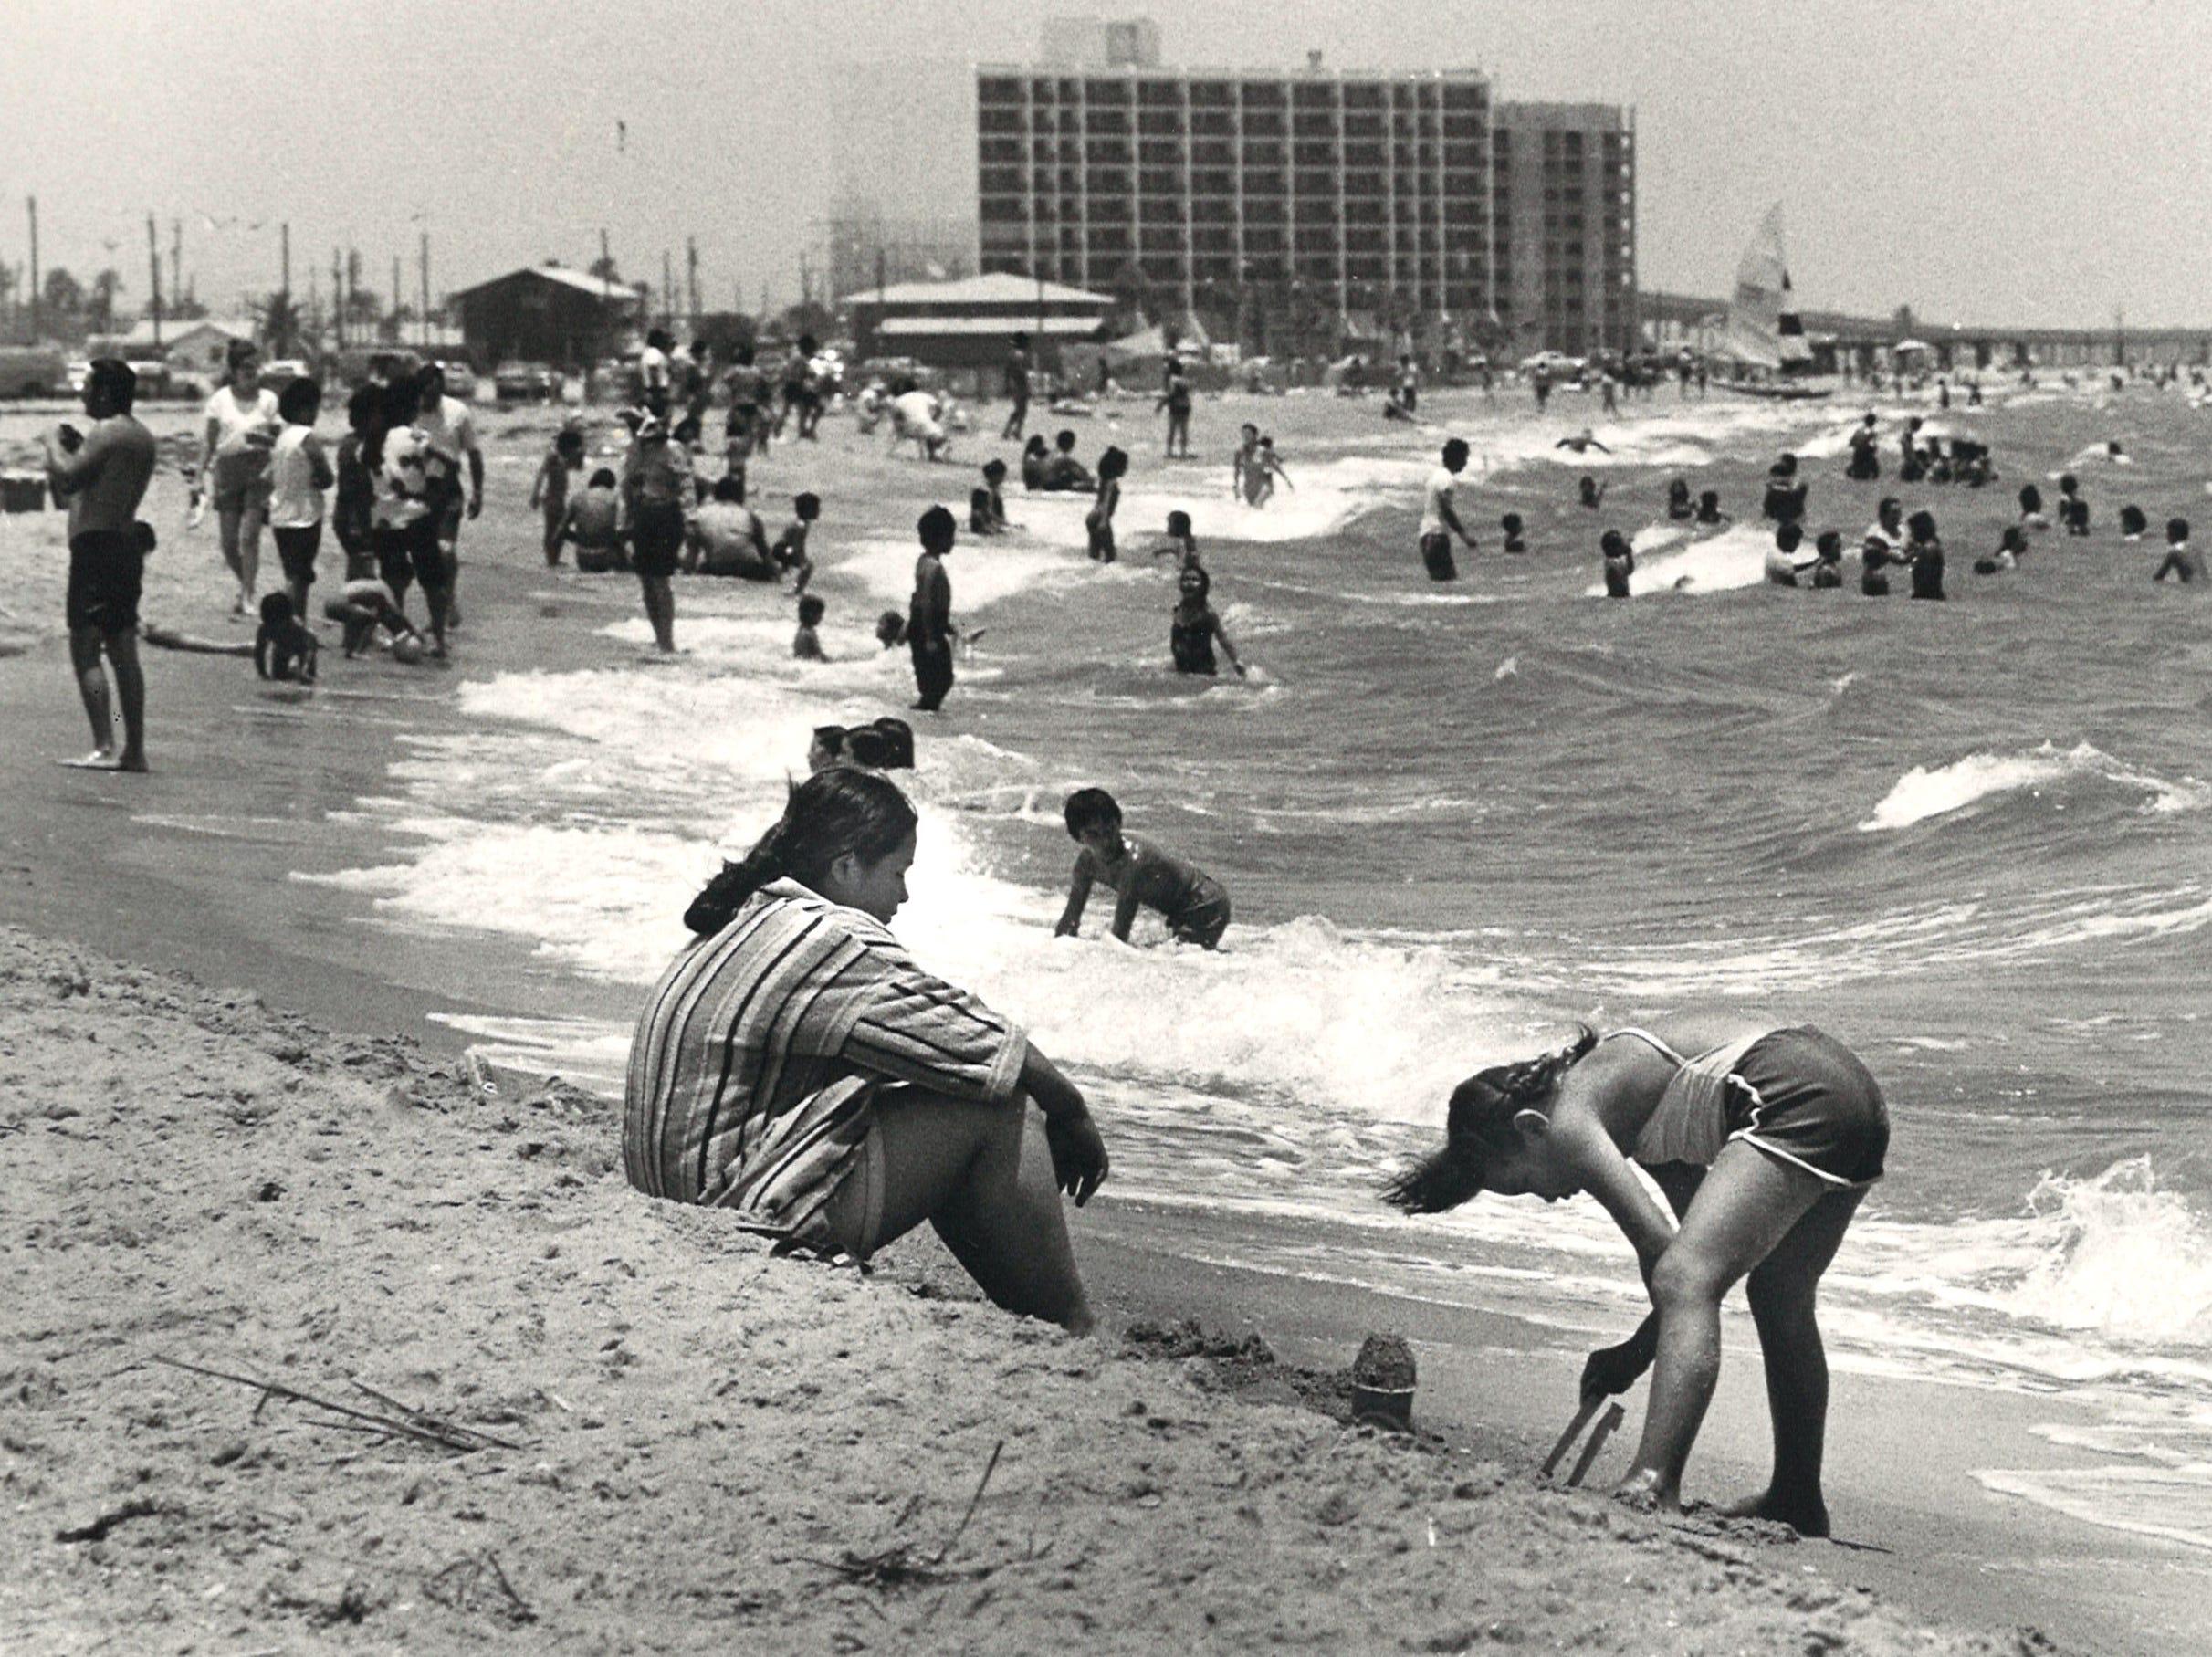 Crowds on Corpus Christi's North Beach on June 8, 1980.